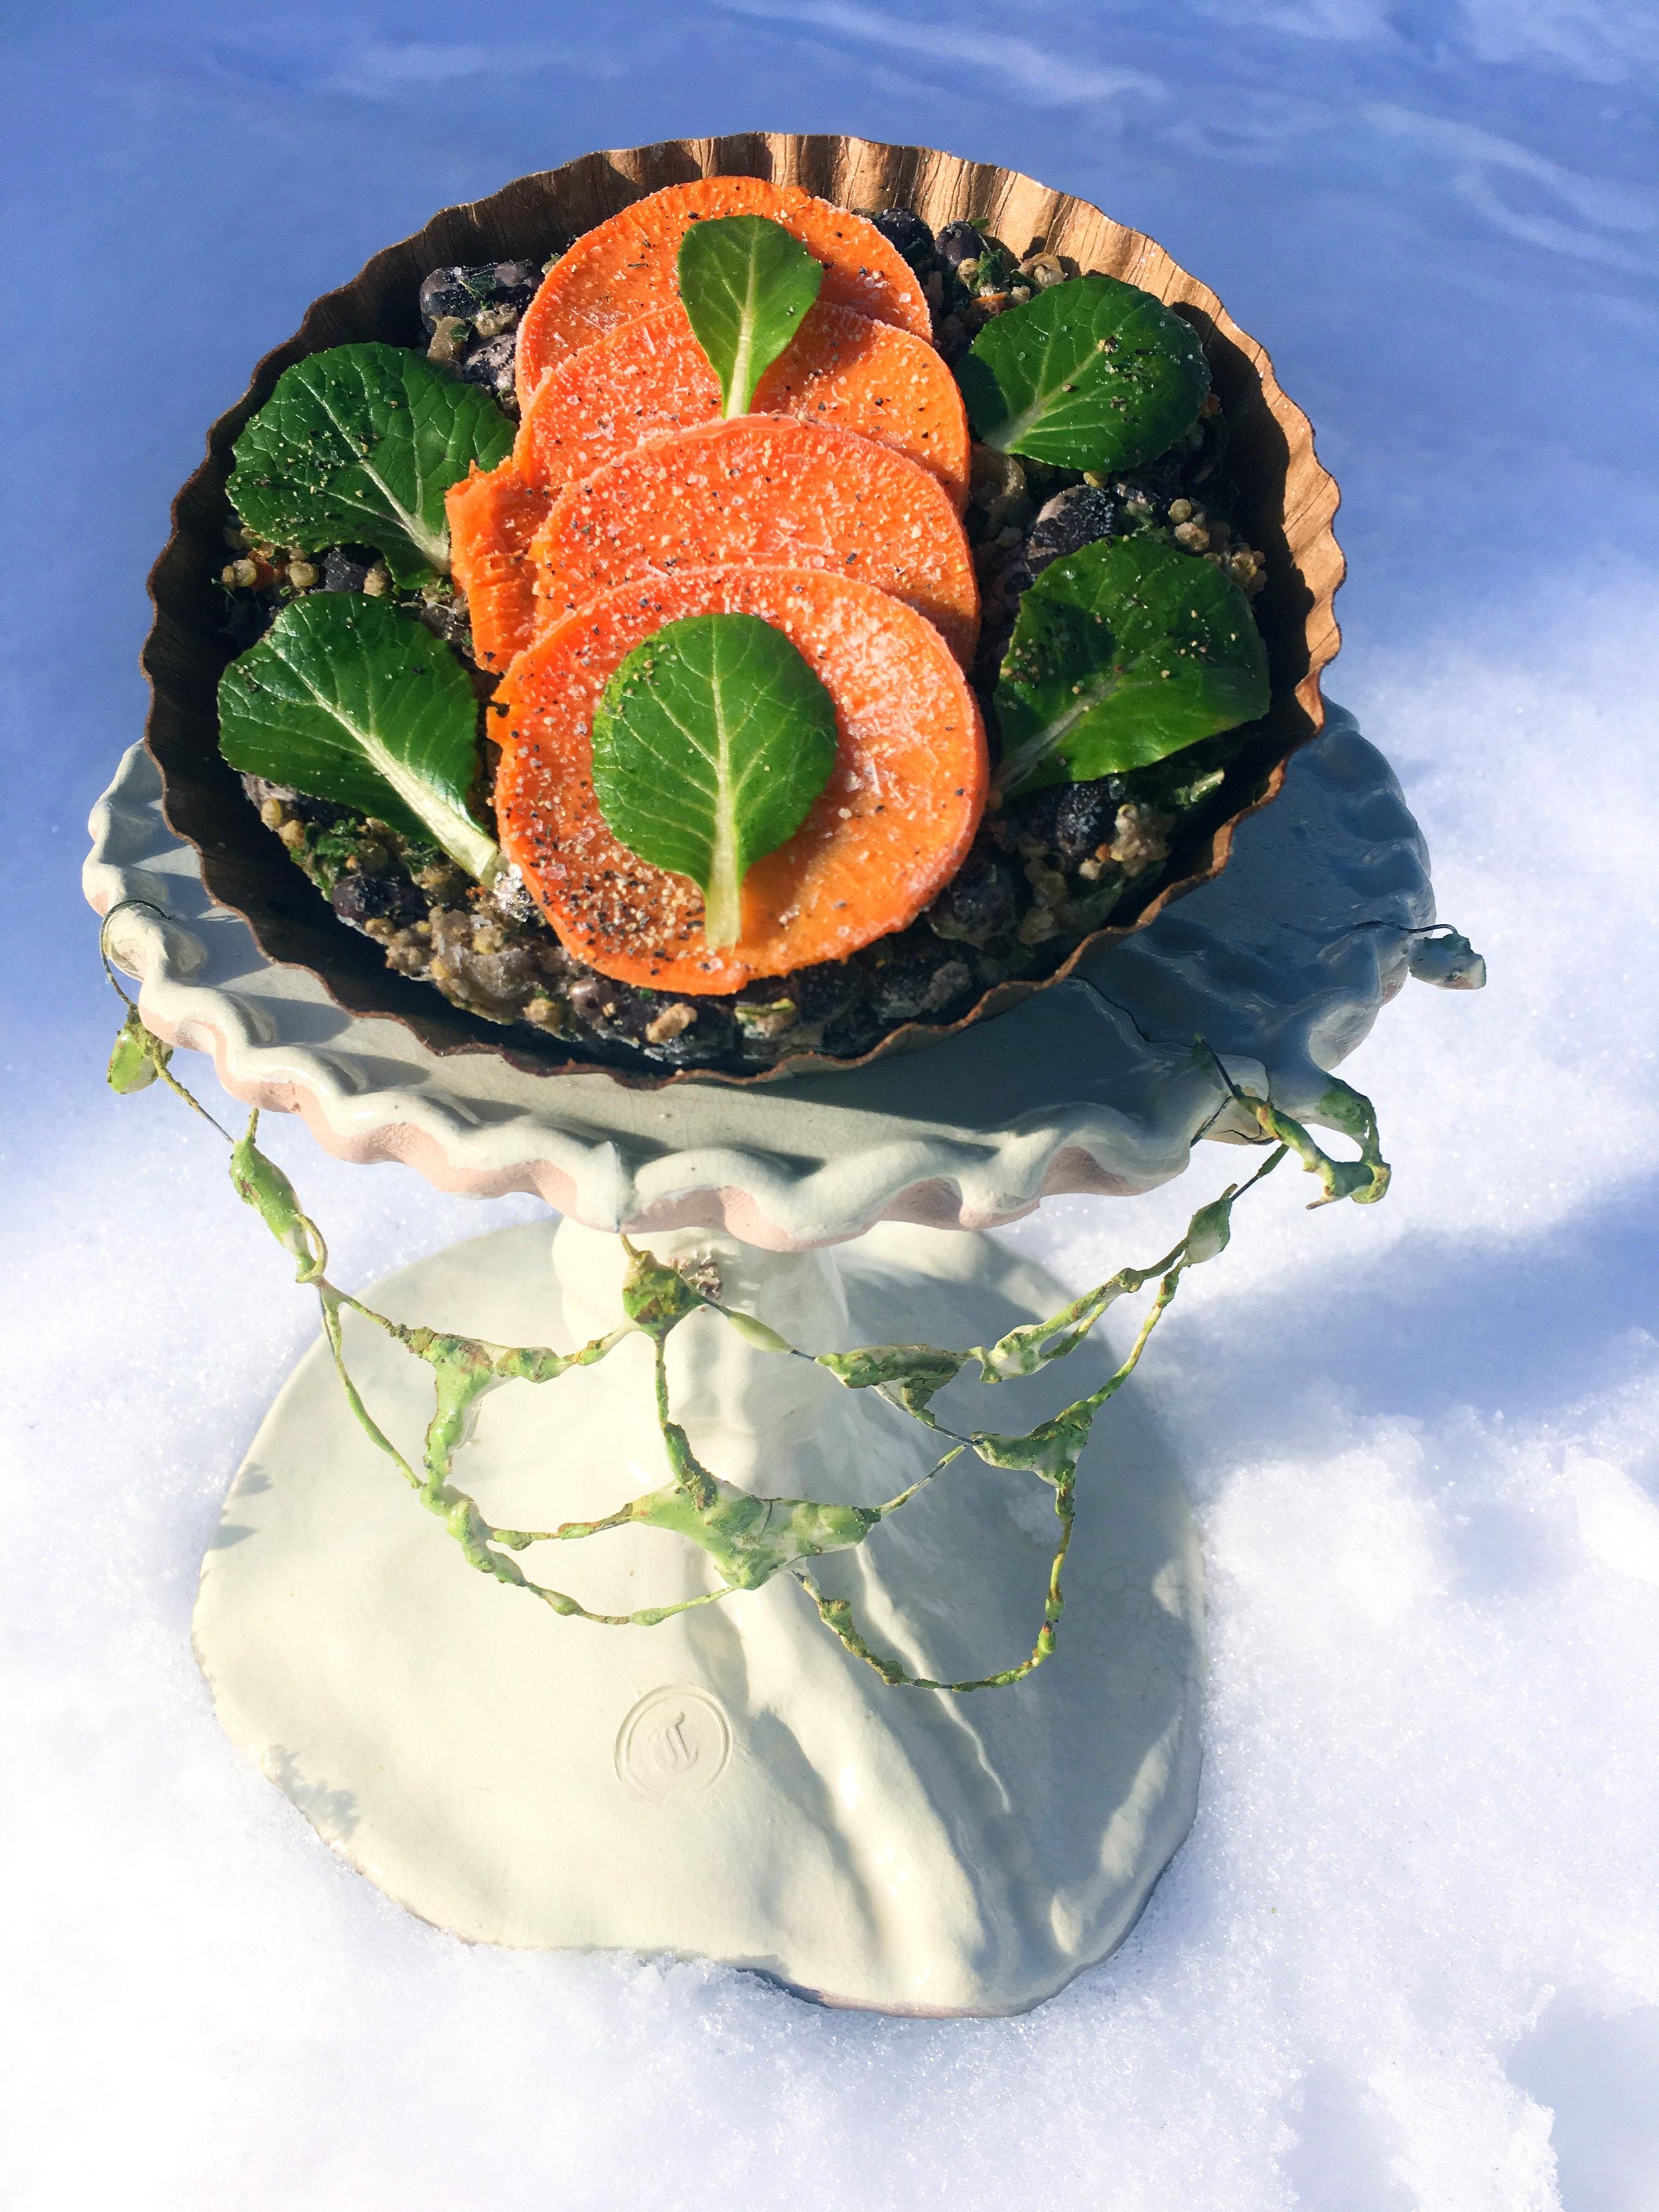 Winter_Vegan_Gluten_Free_Tart_Microgreens